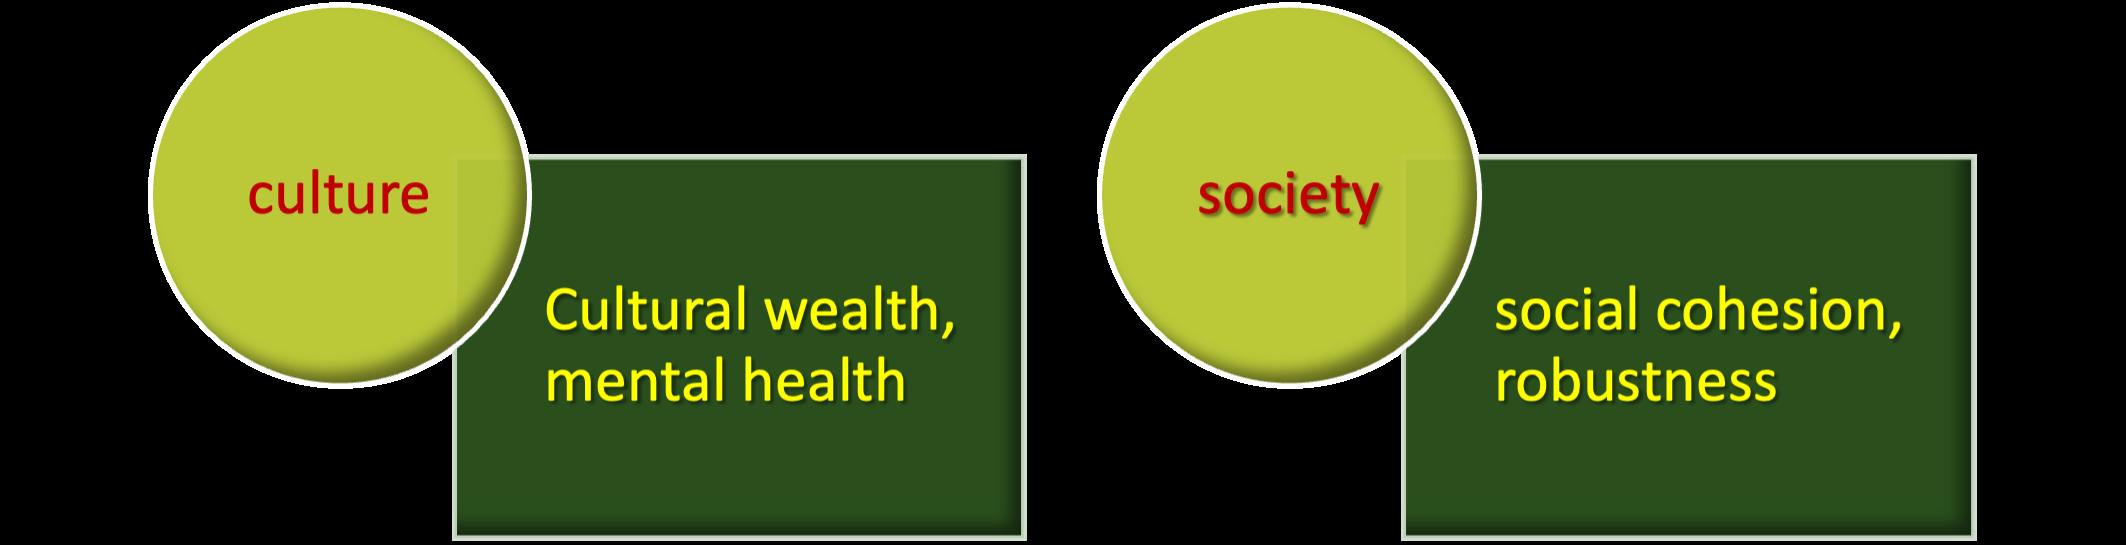 Farkadona Pillars of Health Policy 2